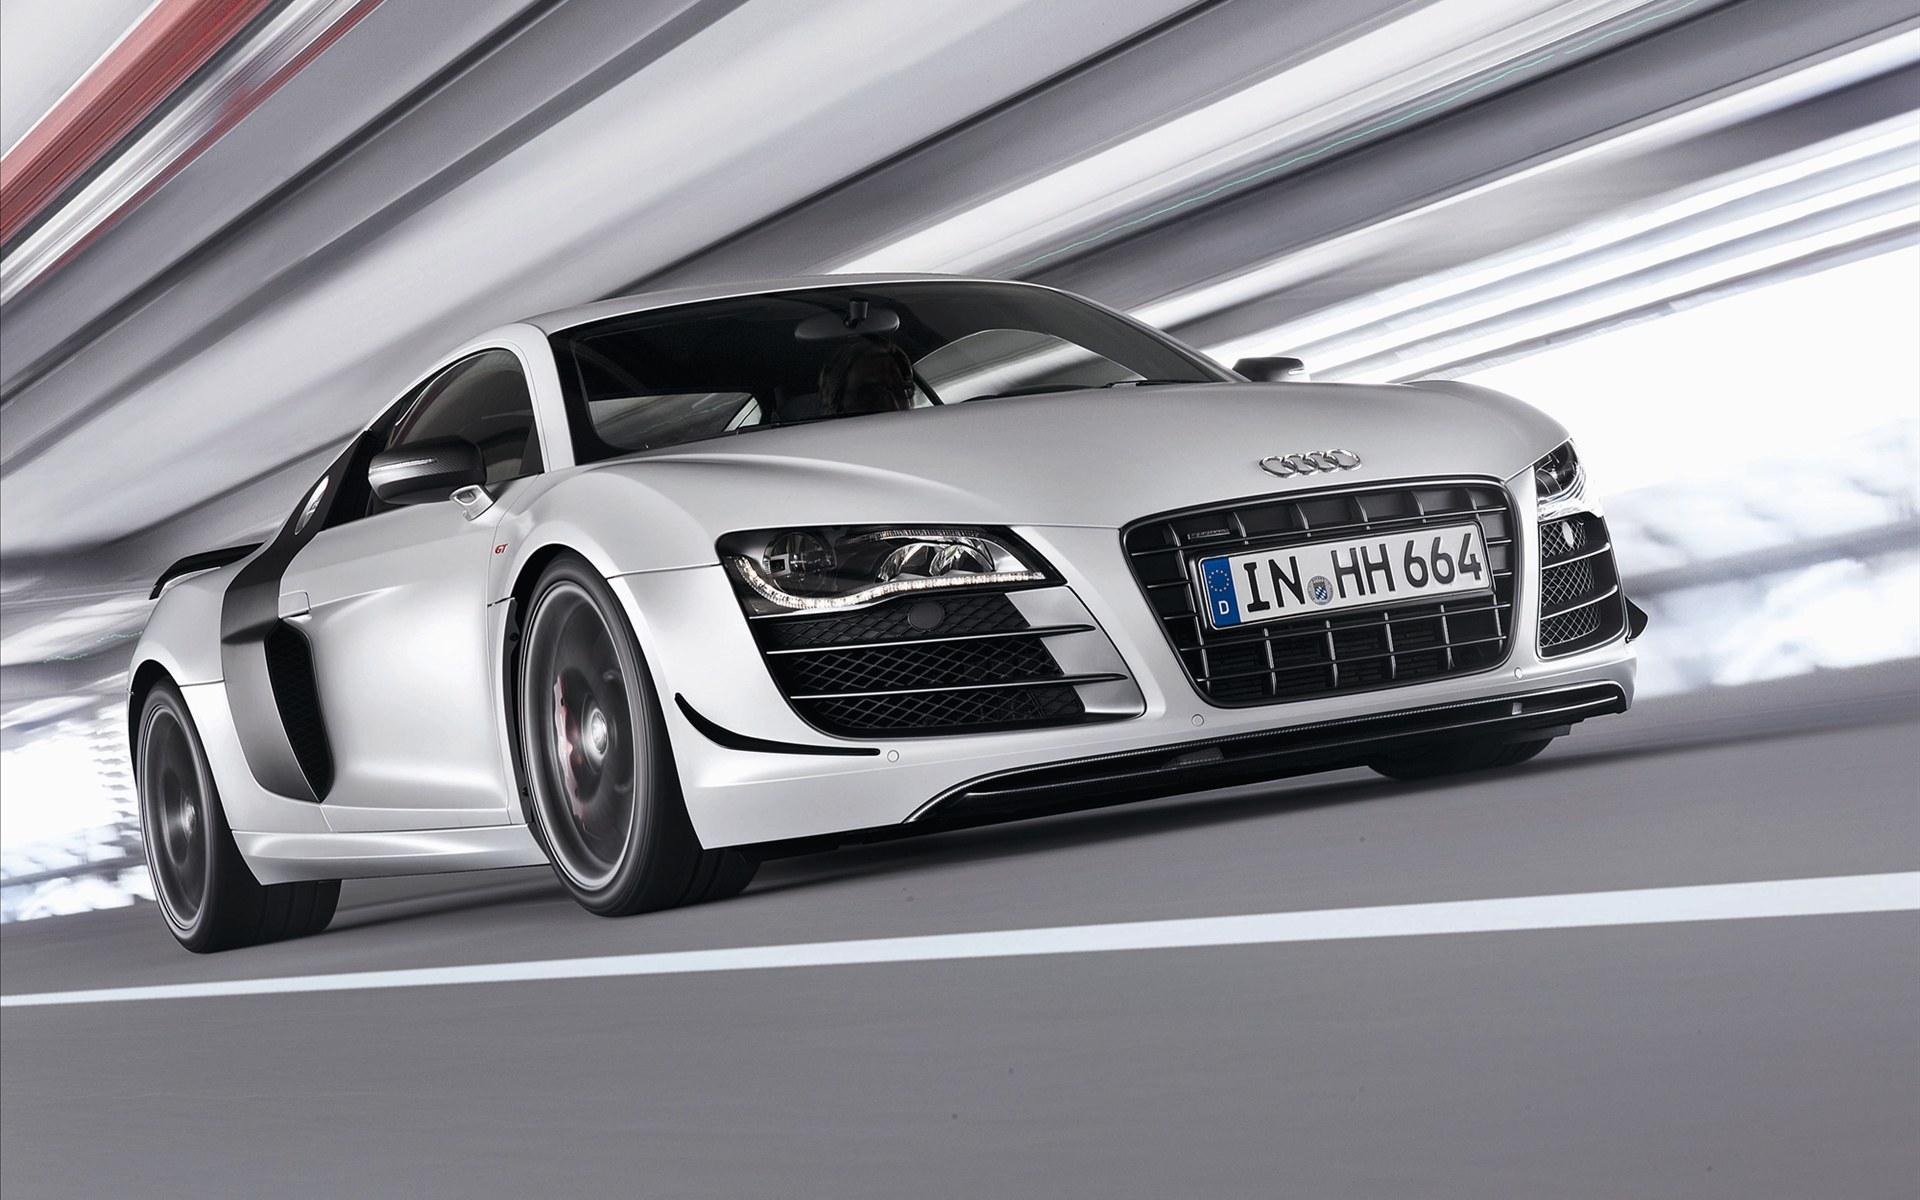 Audi r8 HD Wallpaper Download 1920x1200